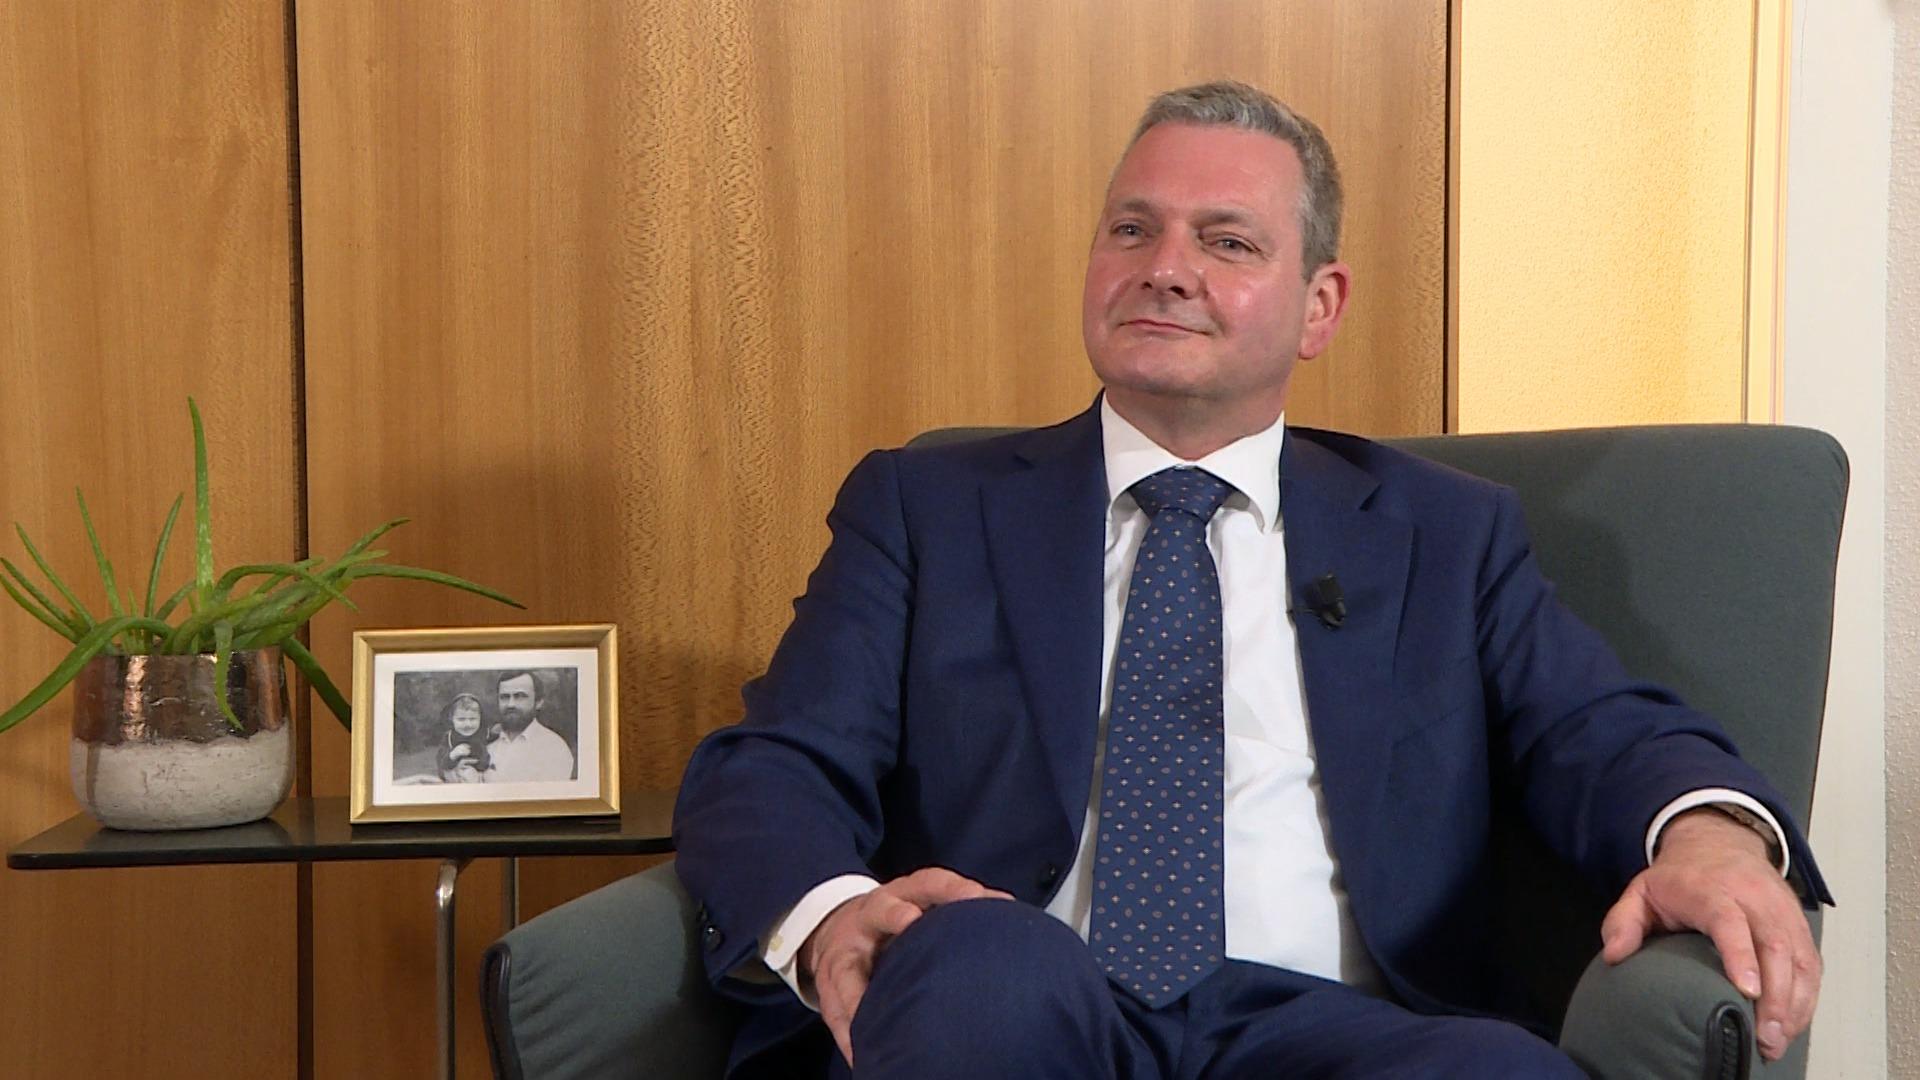 100 kandidaten: Frédéric Erens (Vlaams Belang)